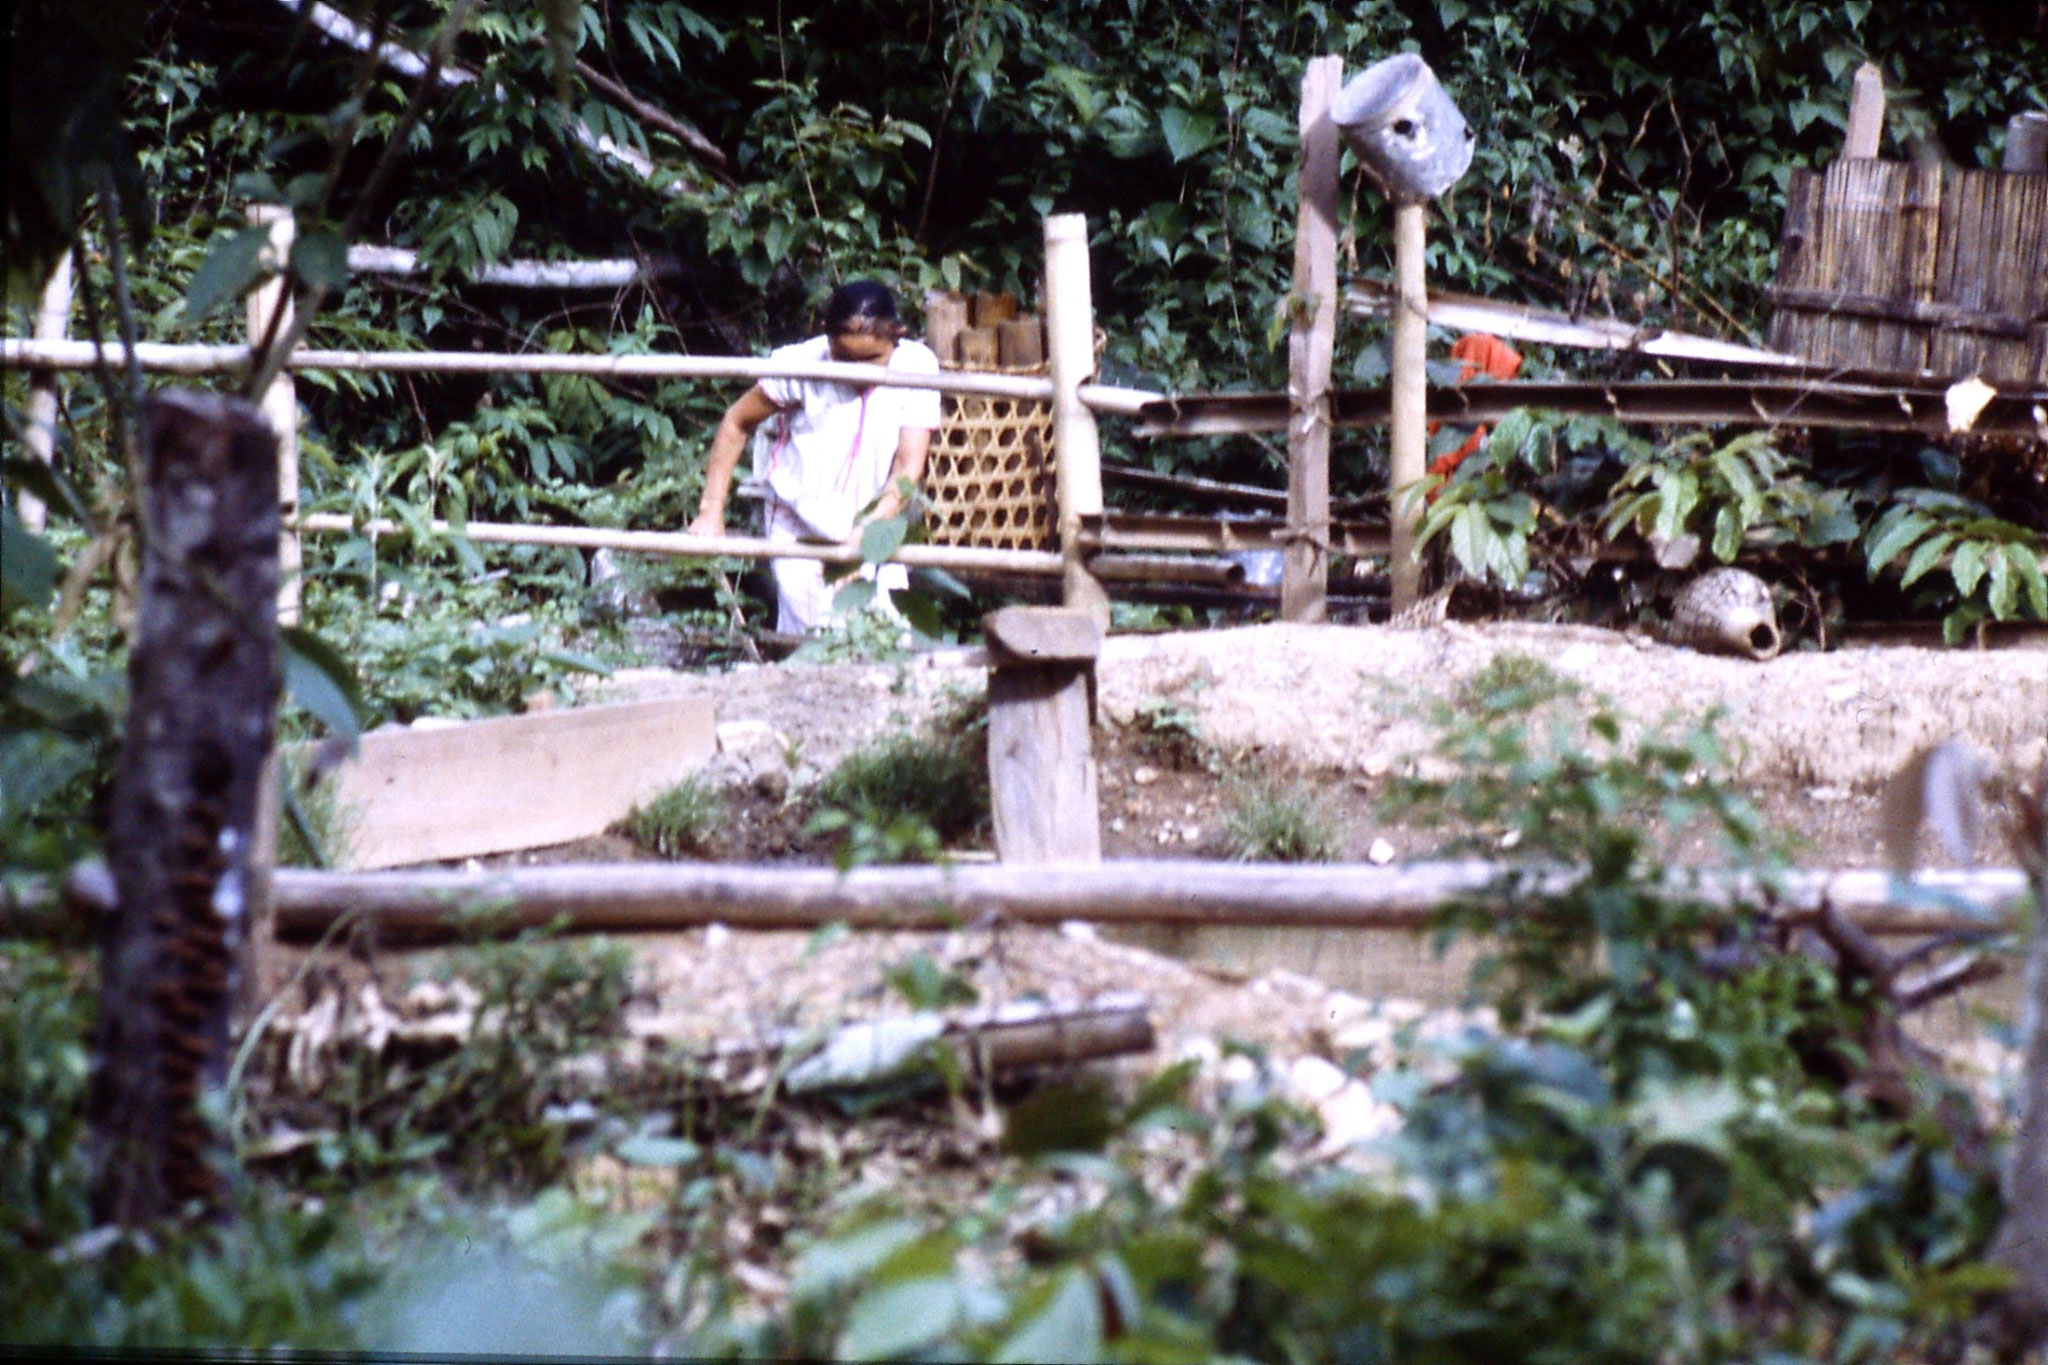 12/6/1990: 30: Trek - Hue Kom Karen village